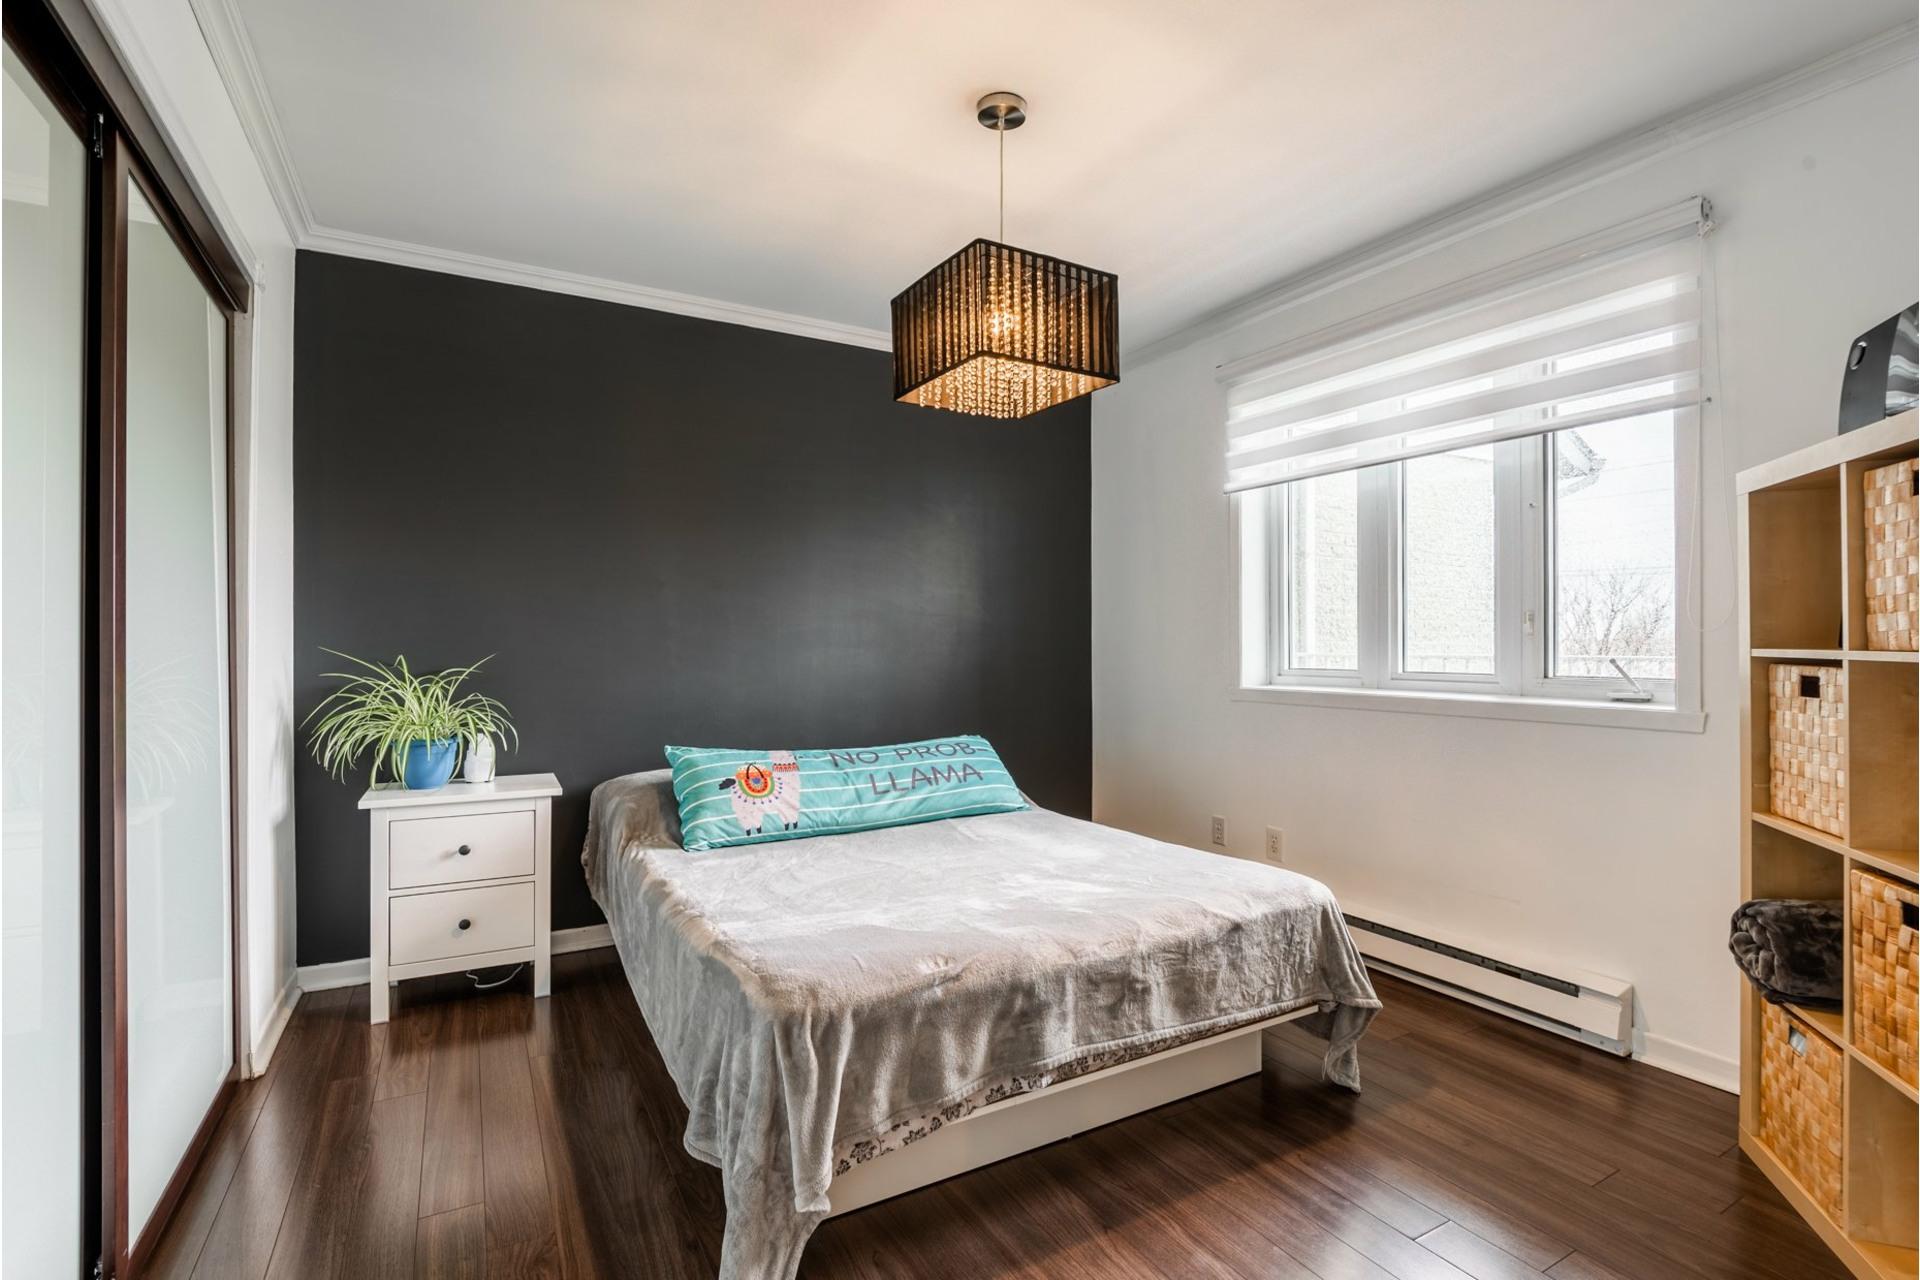 image 2 - Apartment For sale Saint-Hubert Longueuil  - 4 rooms